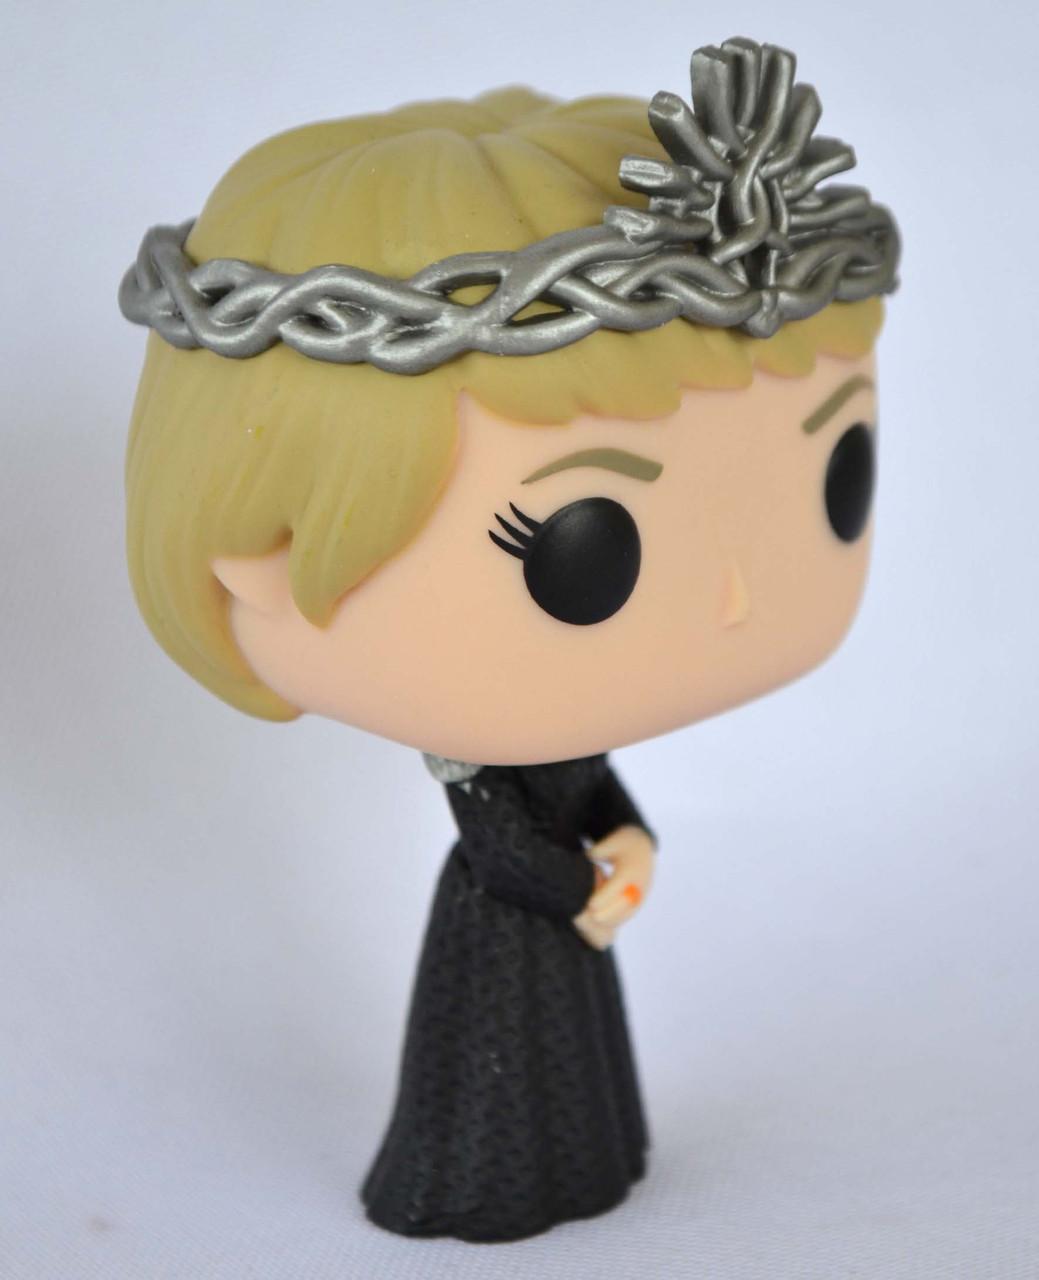 Колекційна фігурка Funko Pop! Game of Thrones: Cersei